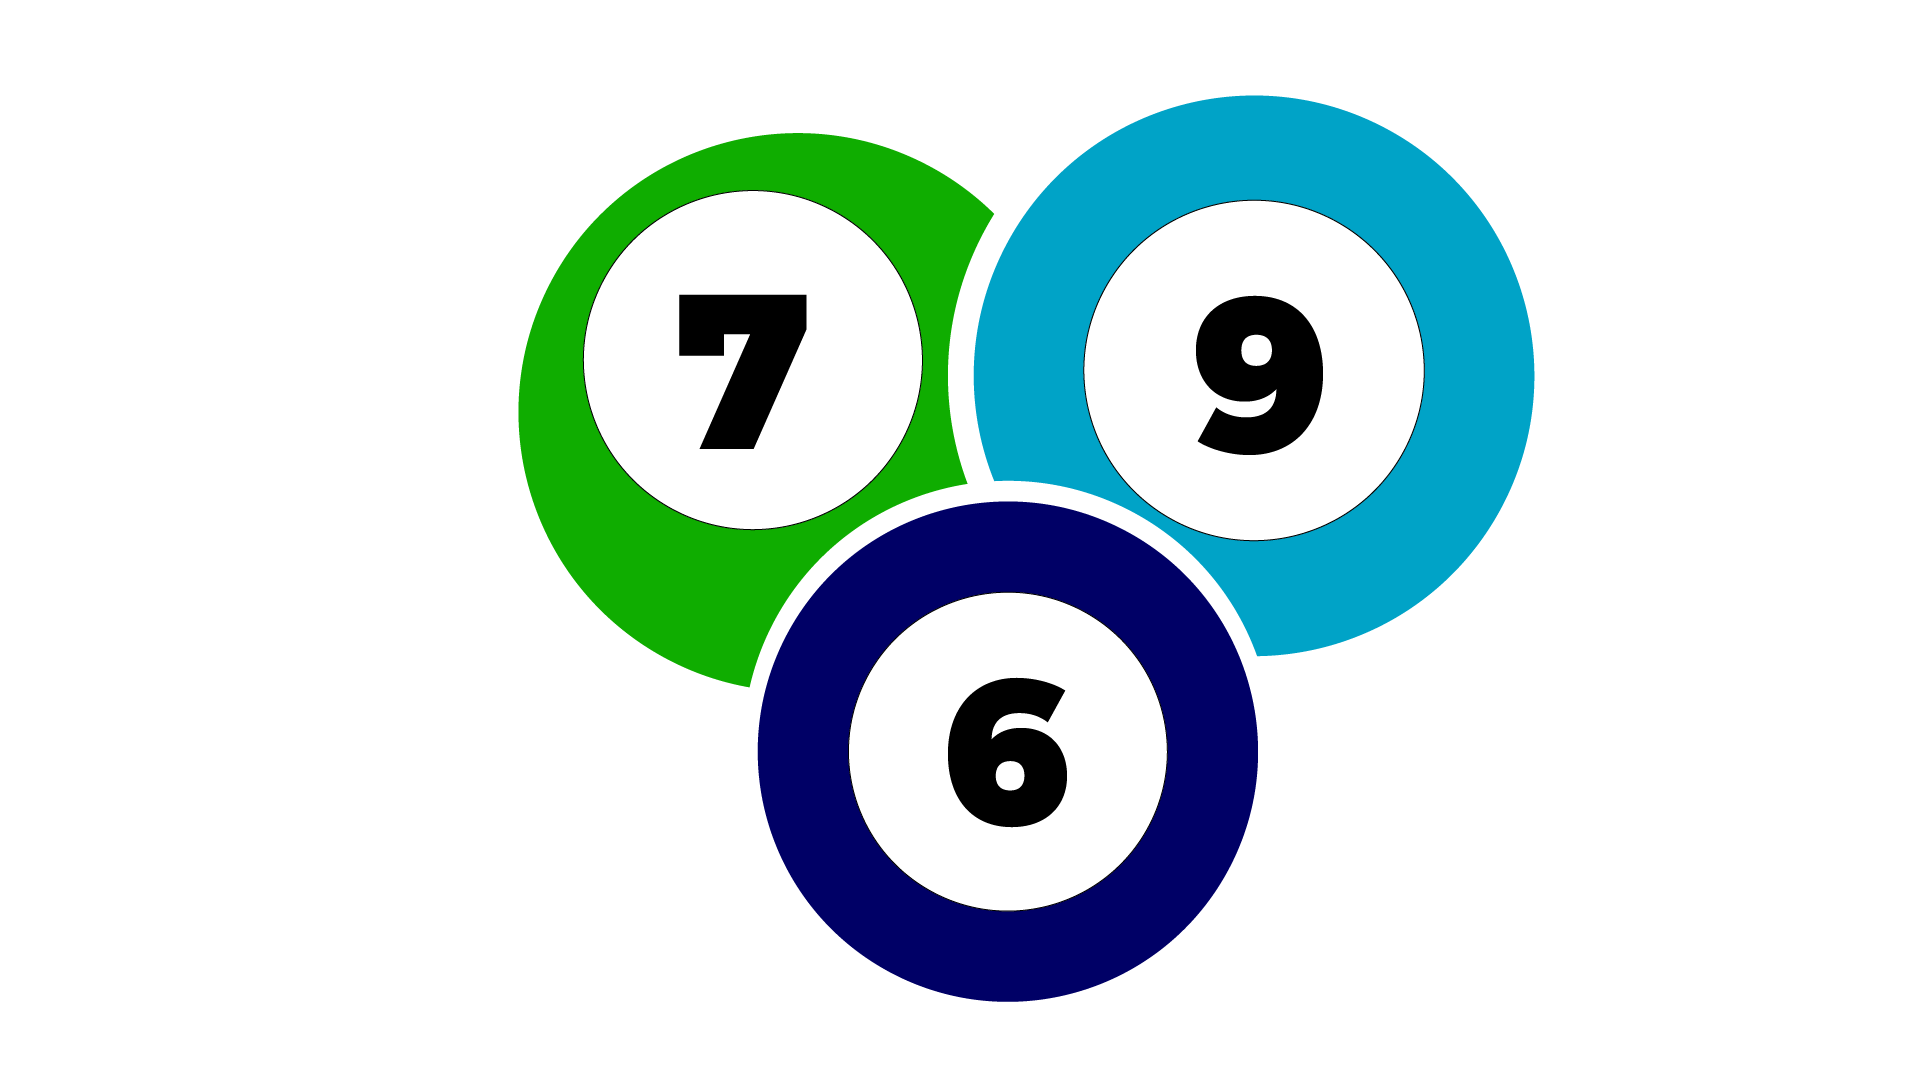 Bingo clipart diversity inclusion. Let s play application